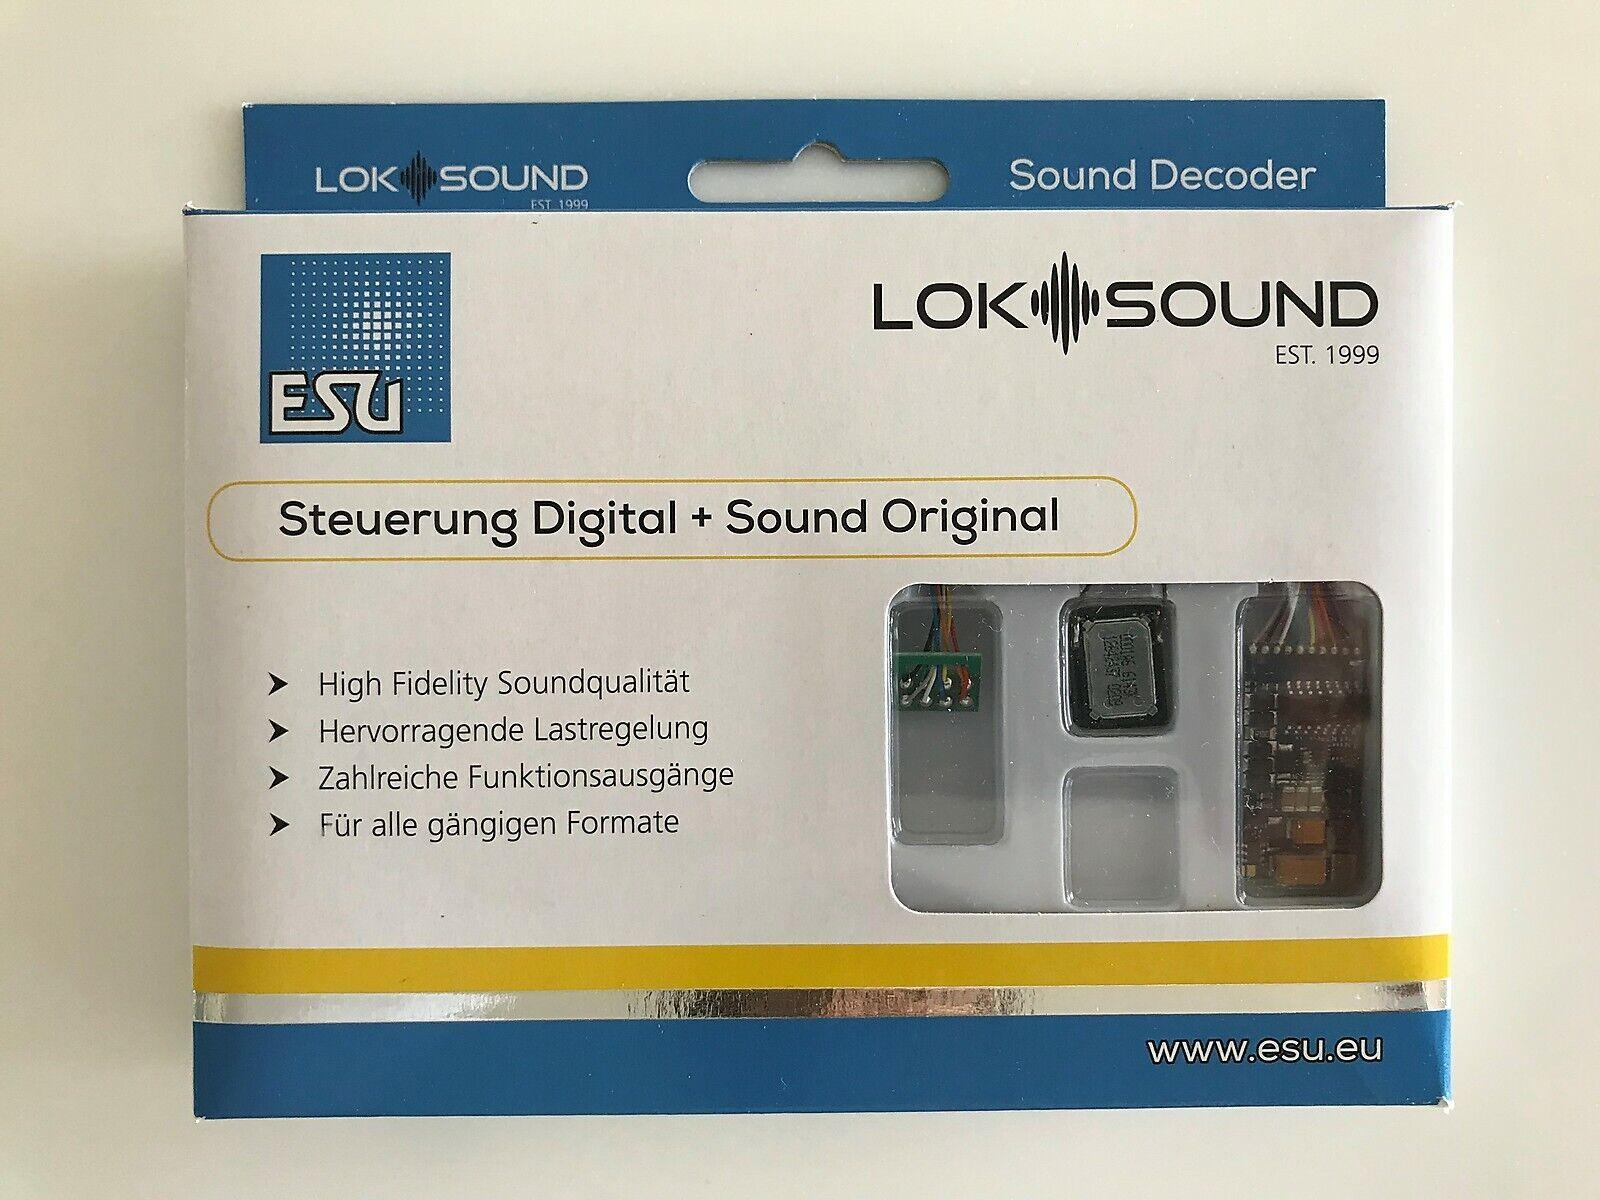 ESU 58410 Loke Sound 5 Multi -Prödocol DCC  MM  SX  M4 (mfx) 8 -pin NEM652 med Speaker